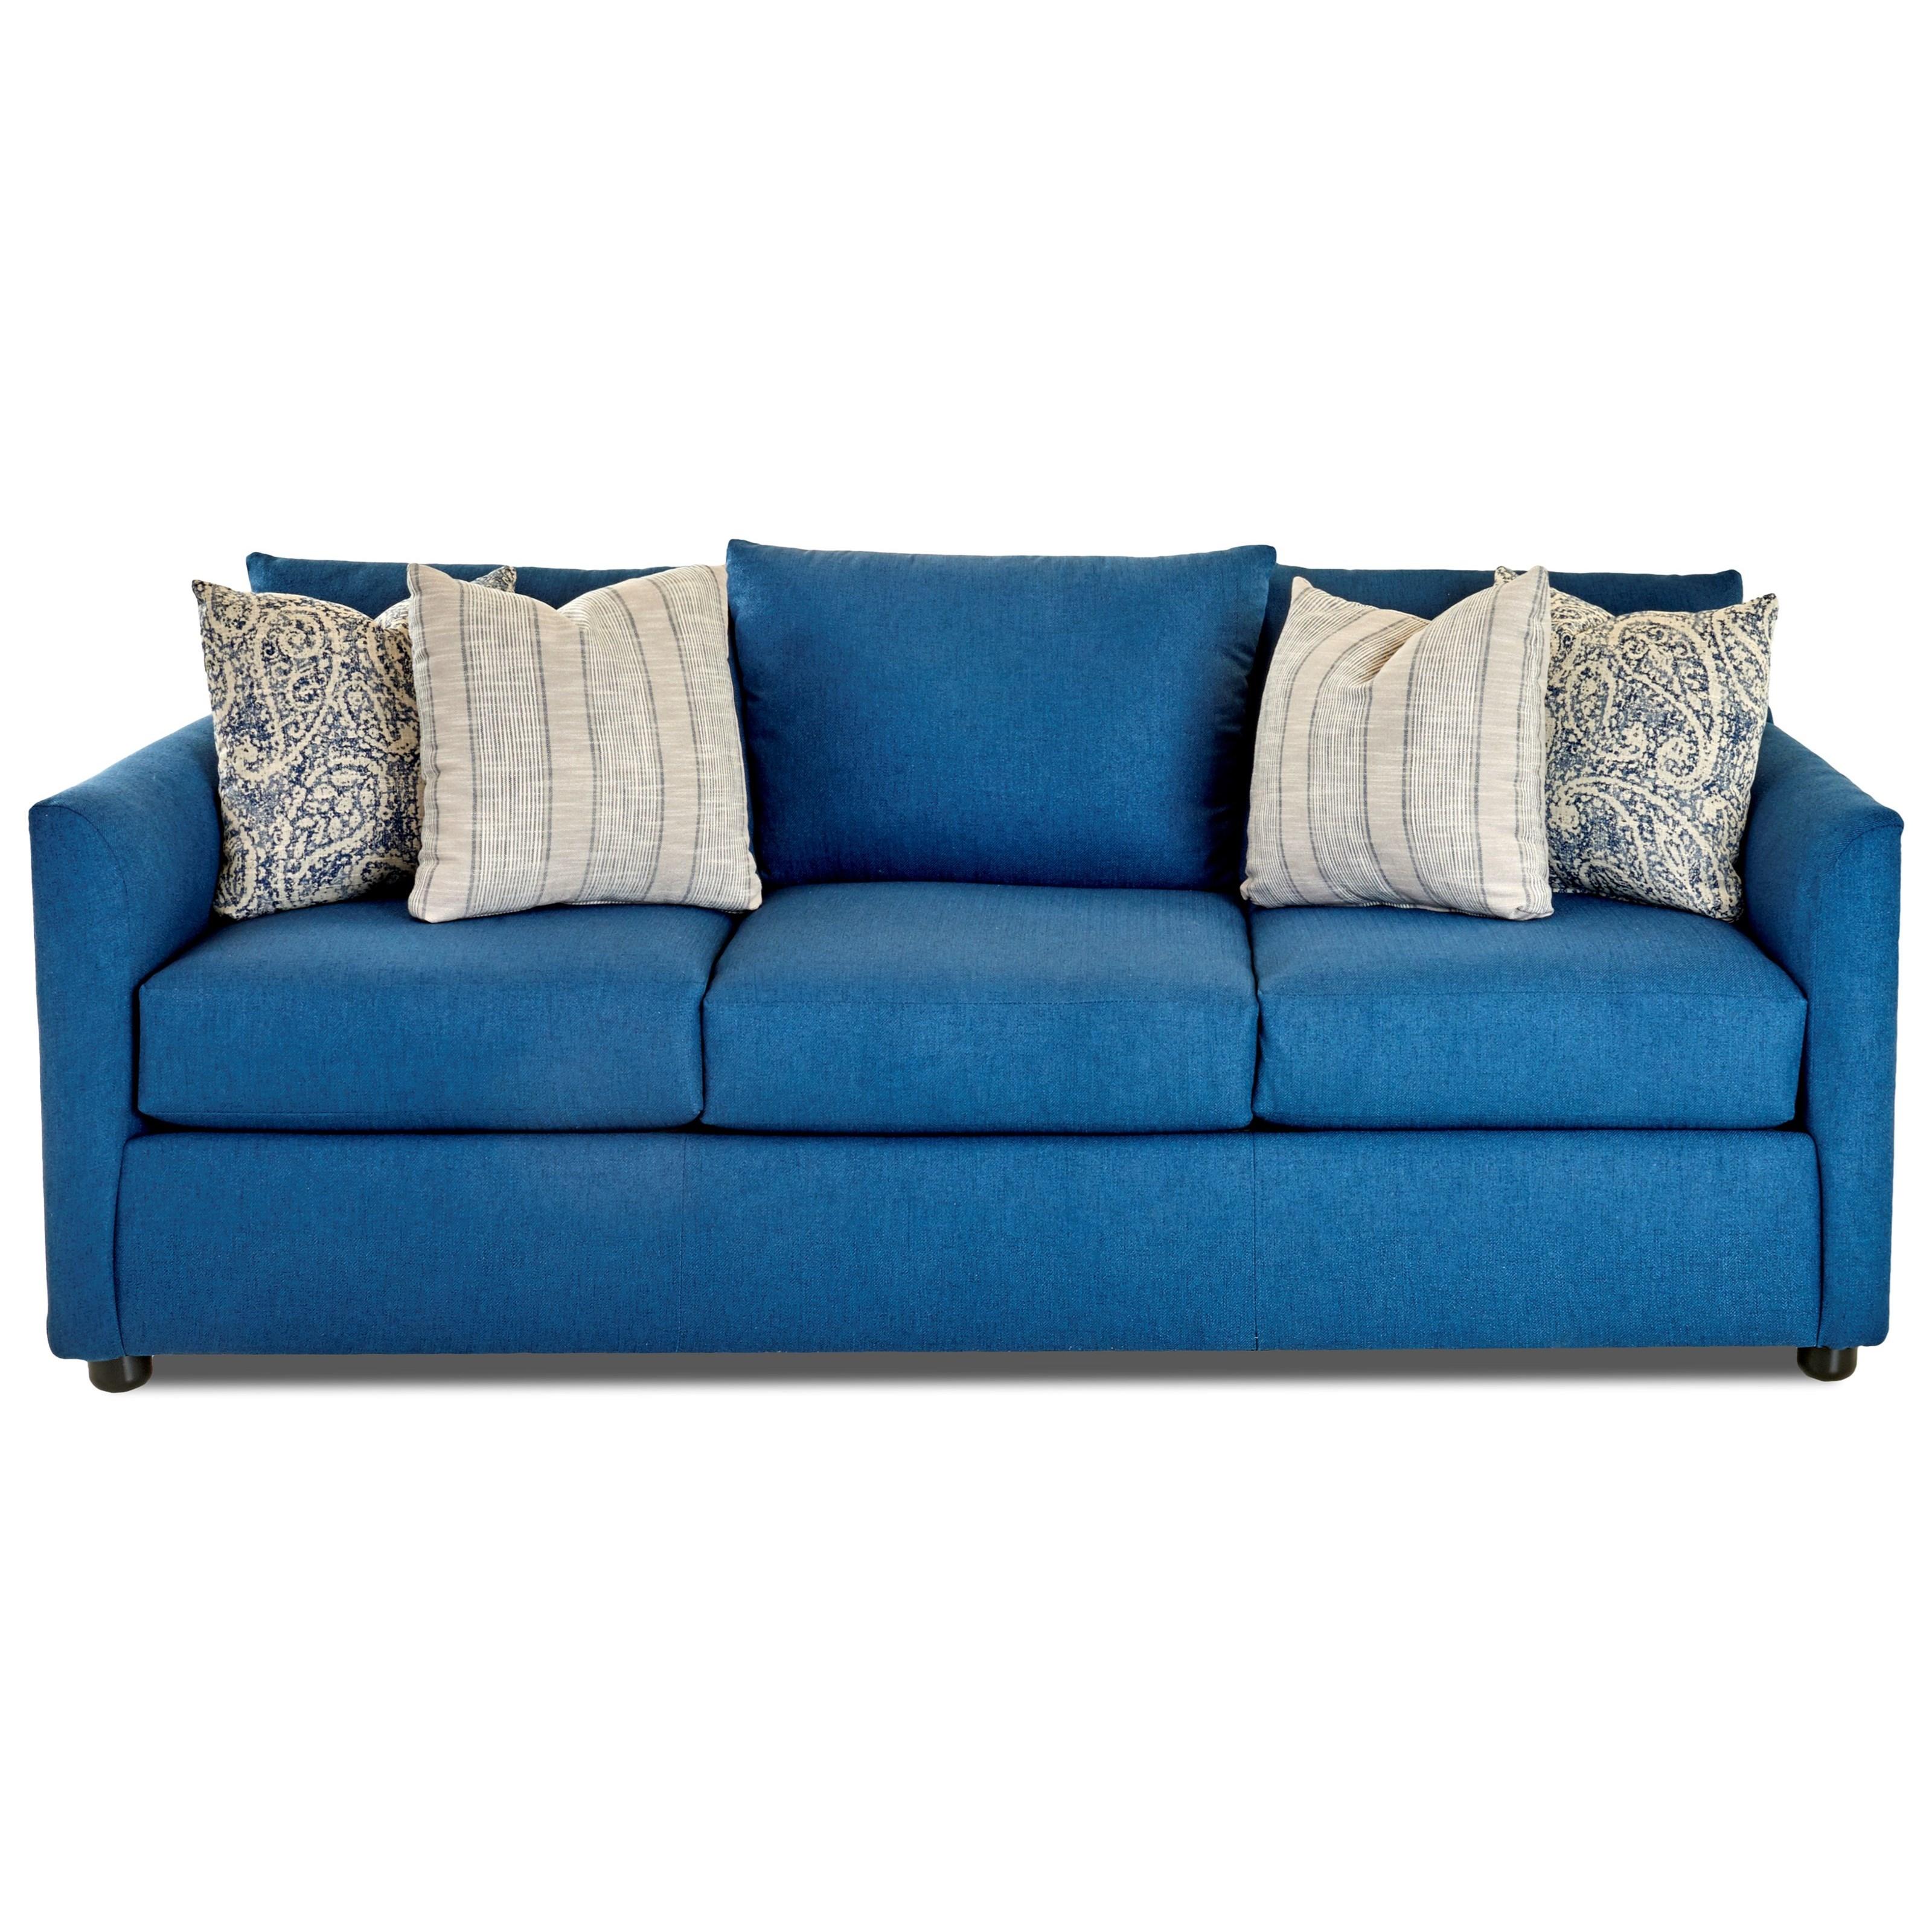 Atlanta Sofa by Klaussner at Northeast Factory Direct